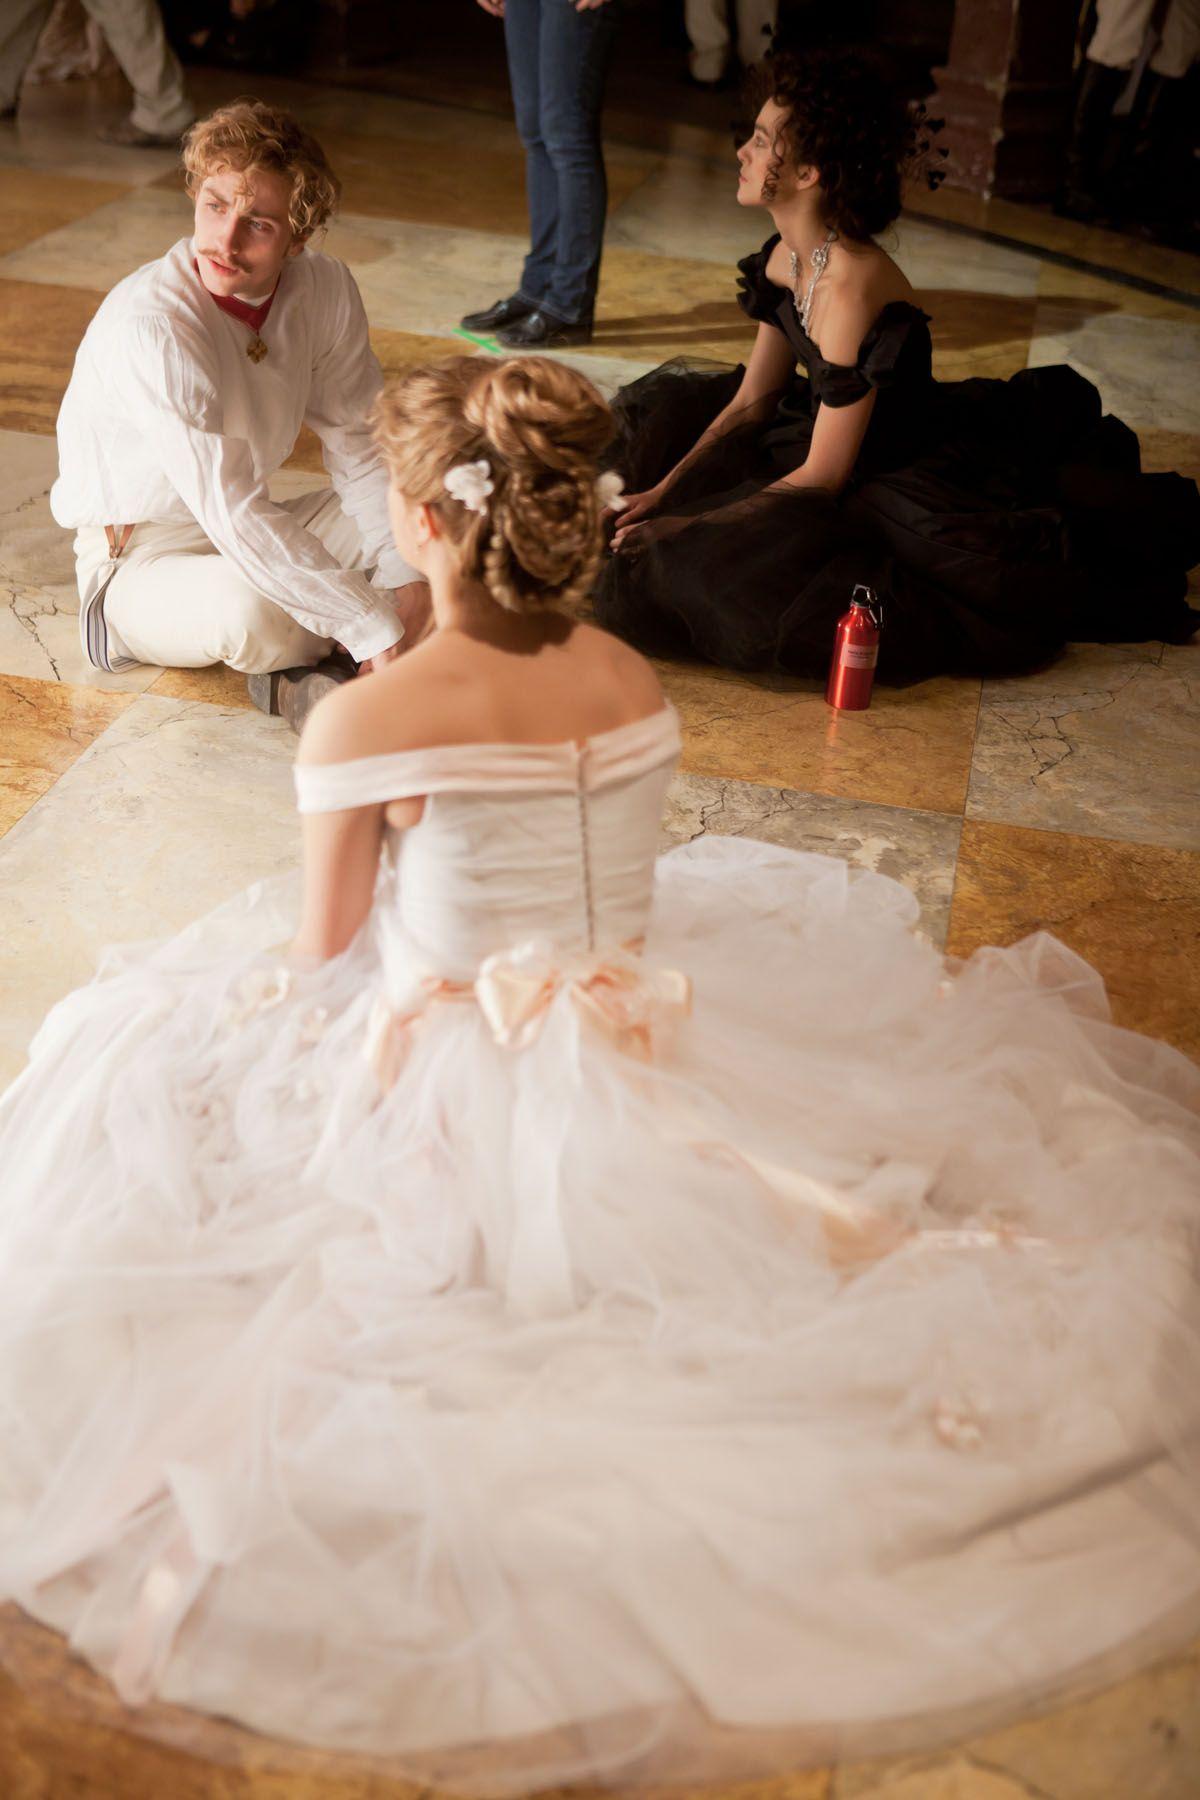 Keira Knightley says Anna Karenina has a new concept News